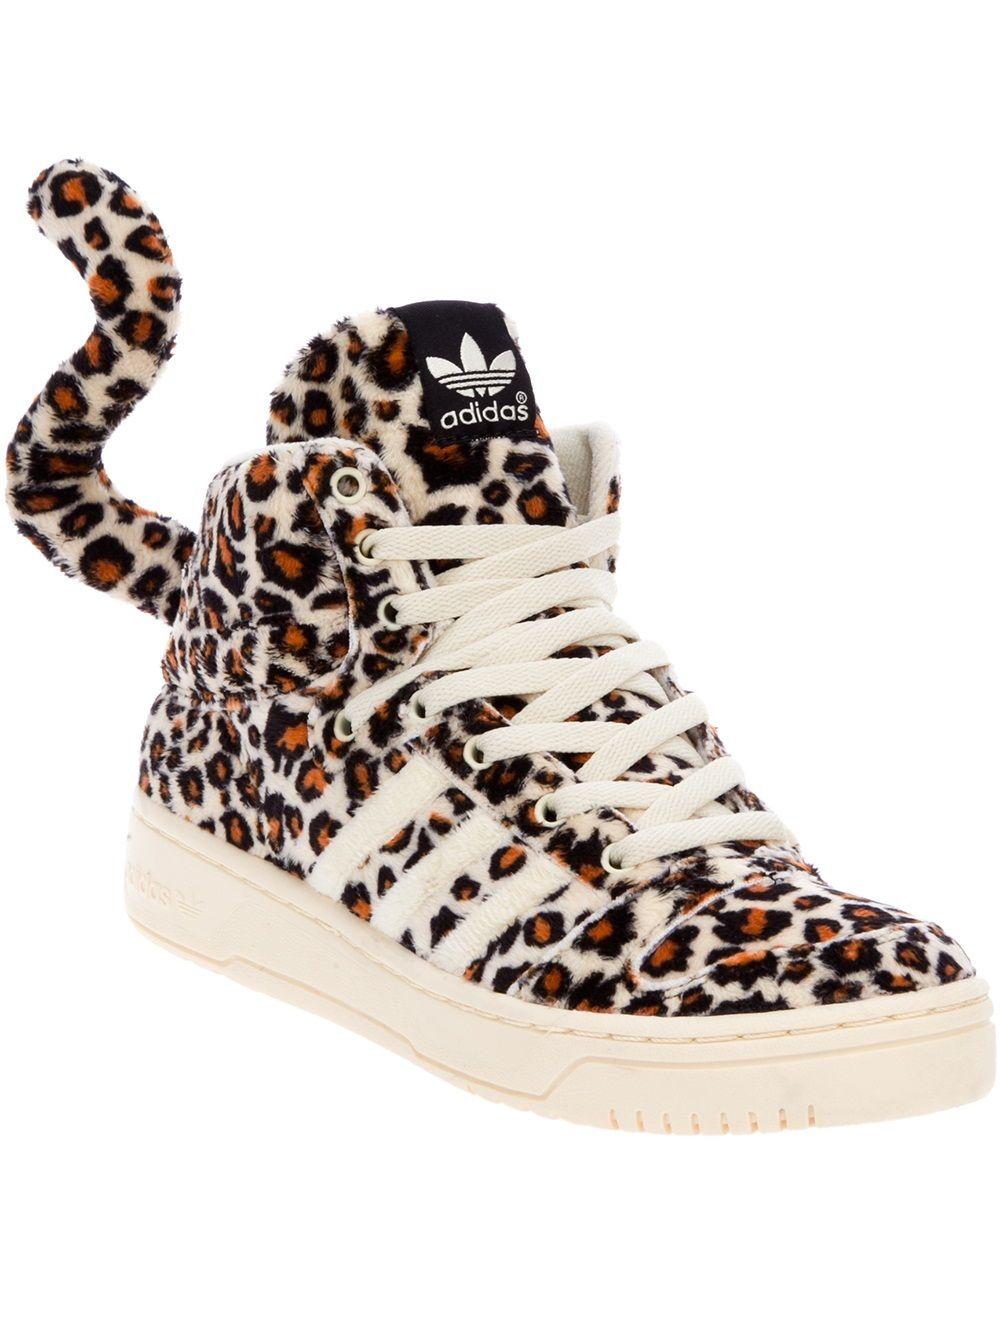 14++ Adidas animal print sneakers ideas